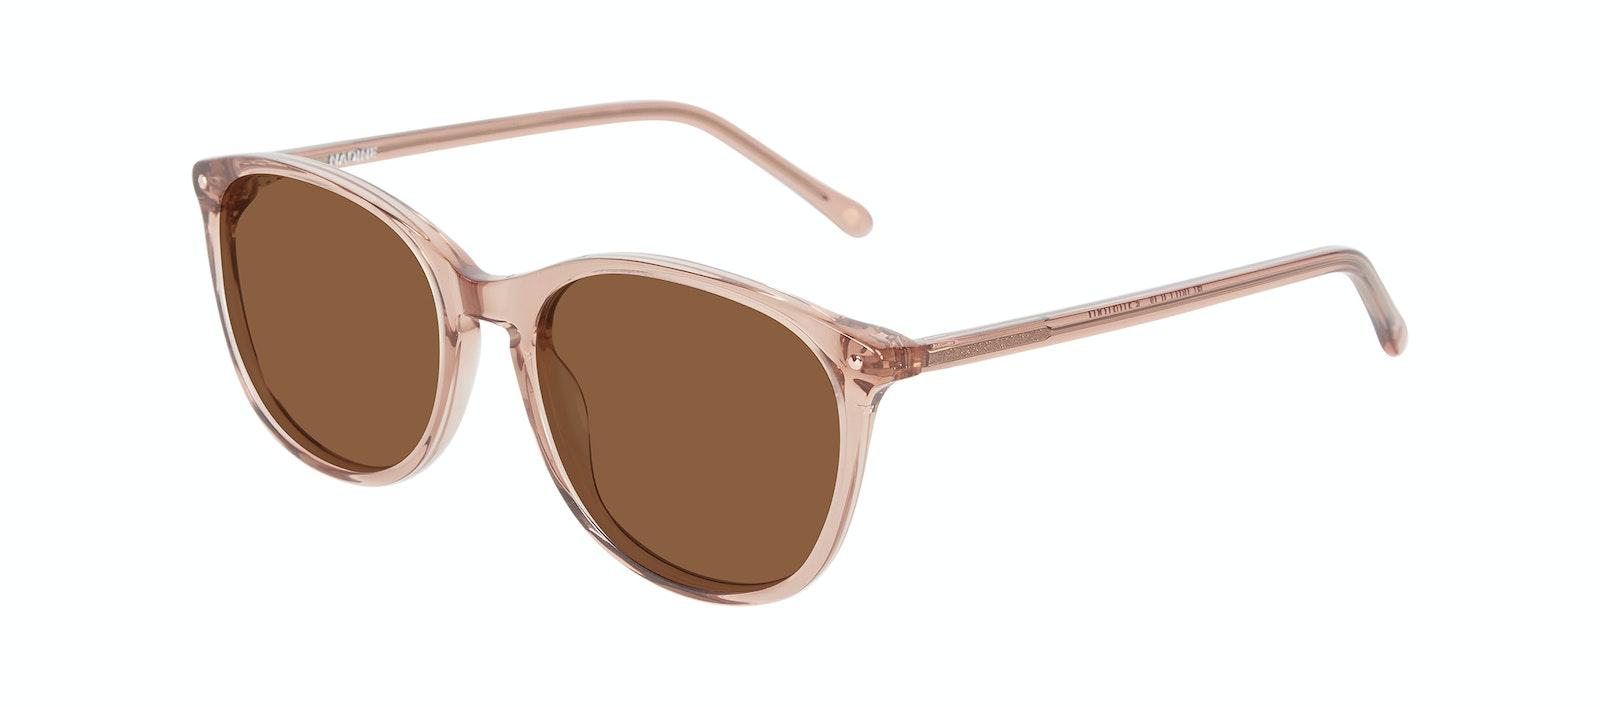 Affordable Fashion Glasses Rectangle Square Round Sunglasses Women Nadine Rose Tilt